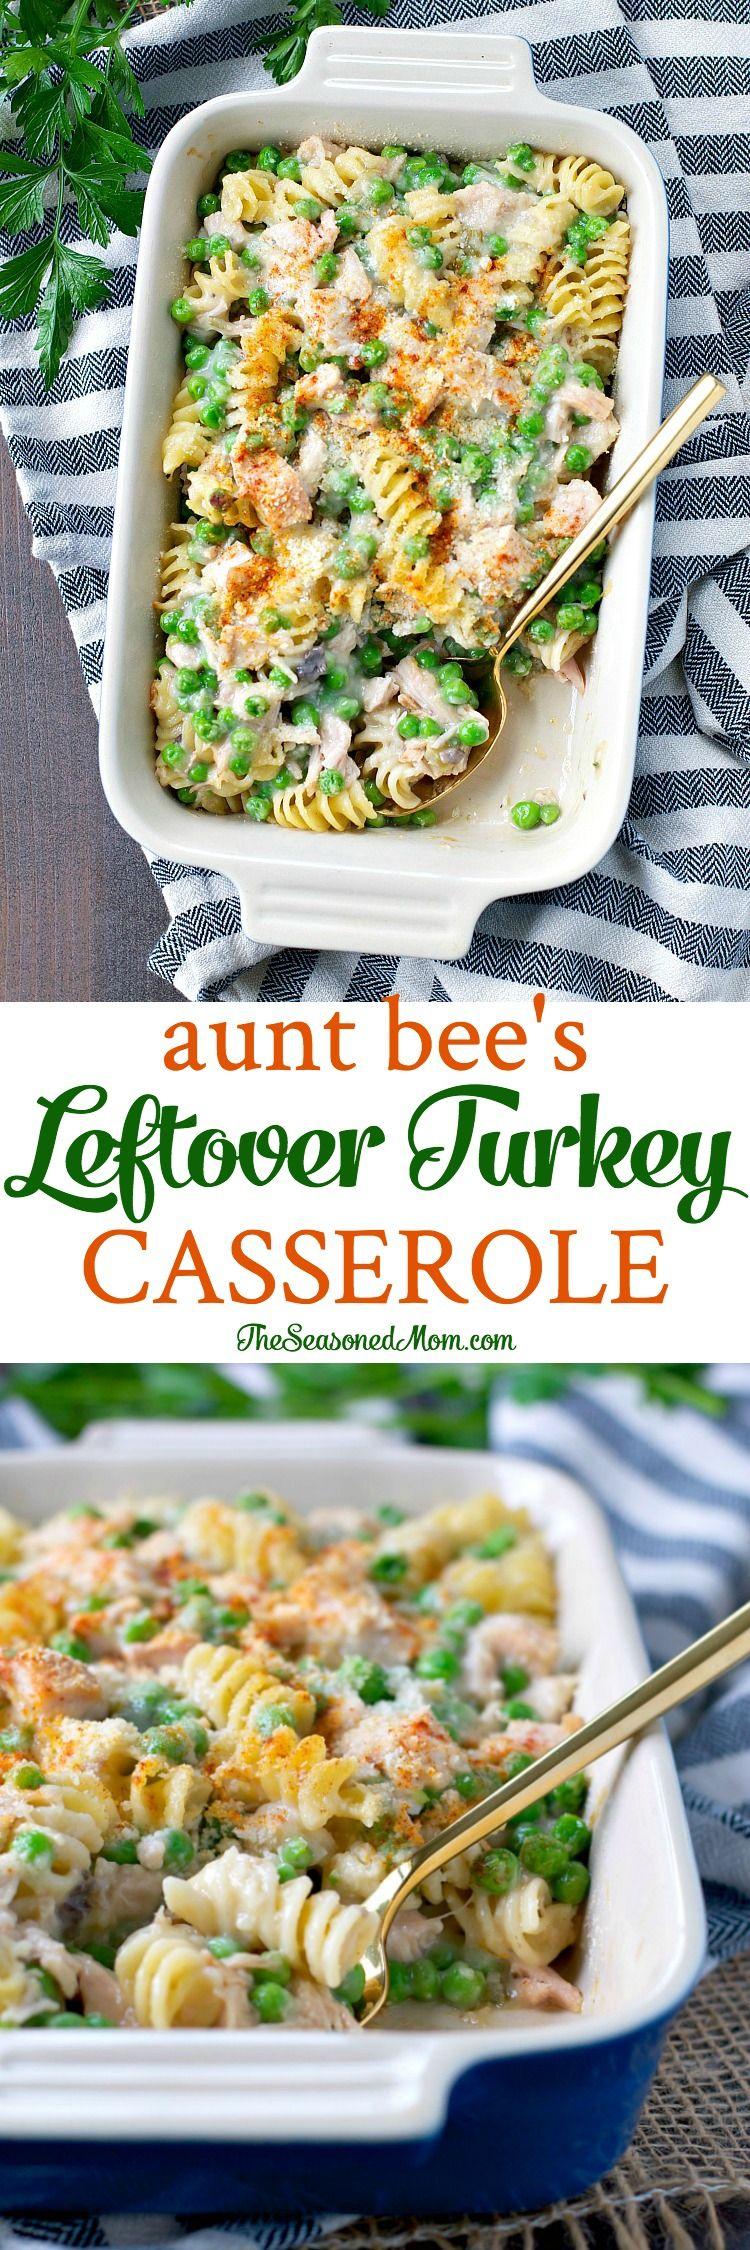 Turkey Ham Leftover Recipes Leftover Turkey Noodle Casserole Turkey Noodle Casserole